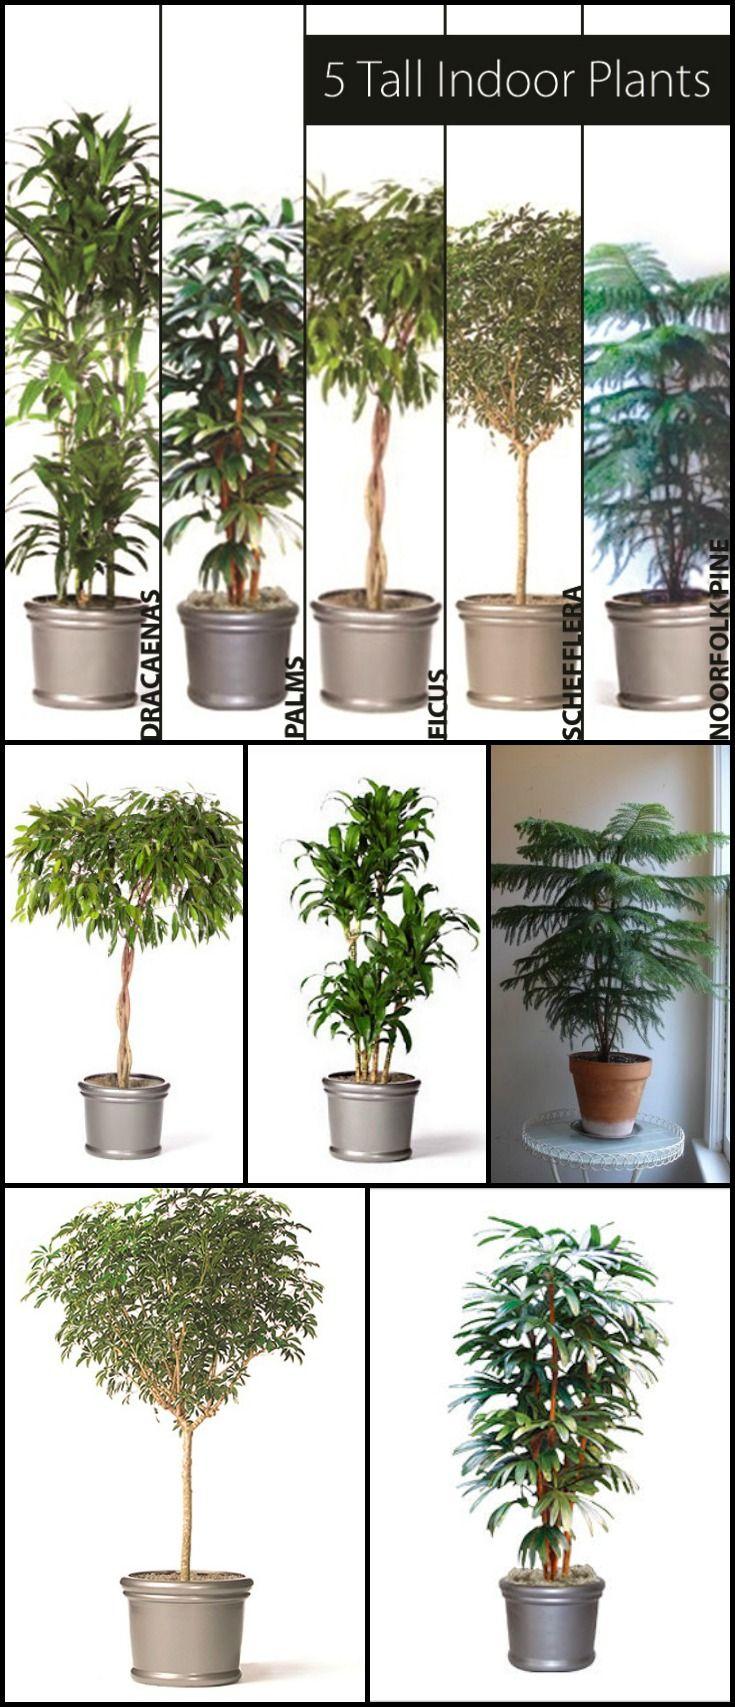 5 Tall Indoor Plants Tall Indoor Plants House Plants 400 x 300